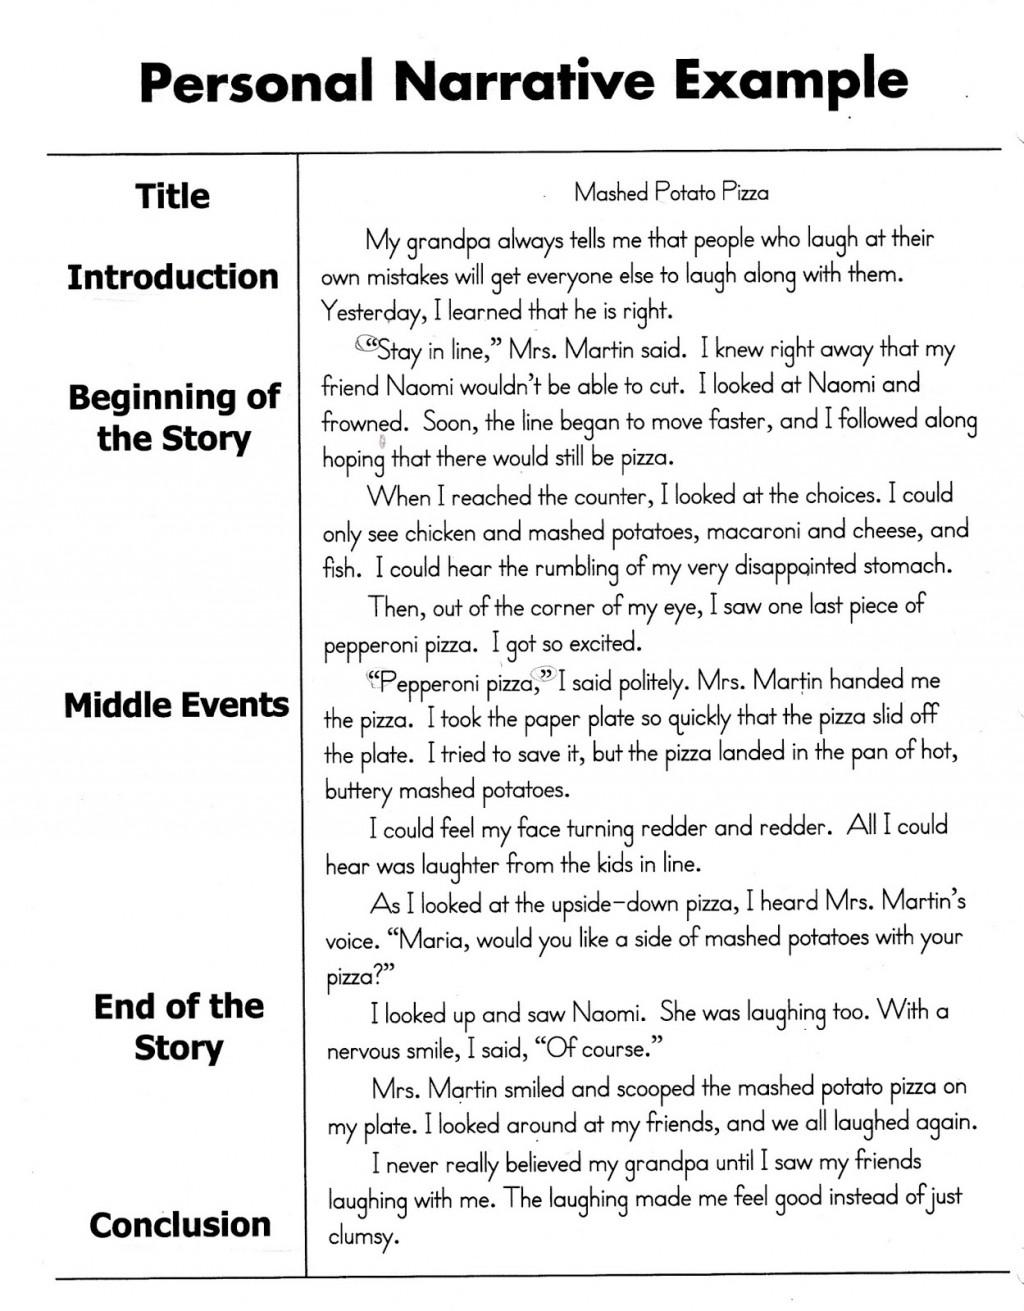 020 8th Grade Essay Topics Example Phenomenal Narrative Us History Questions Large